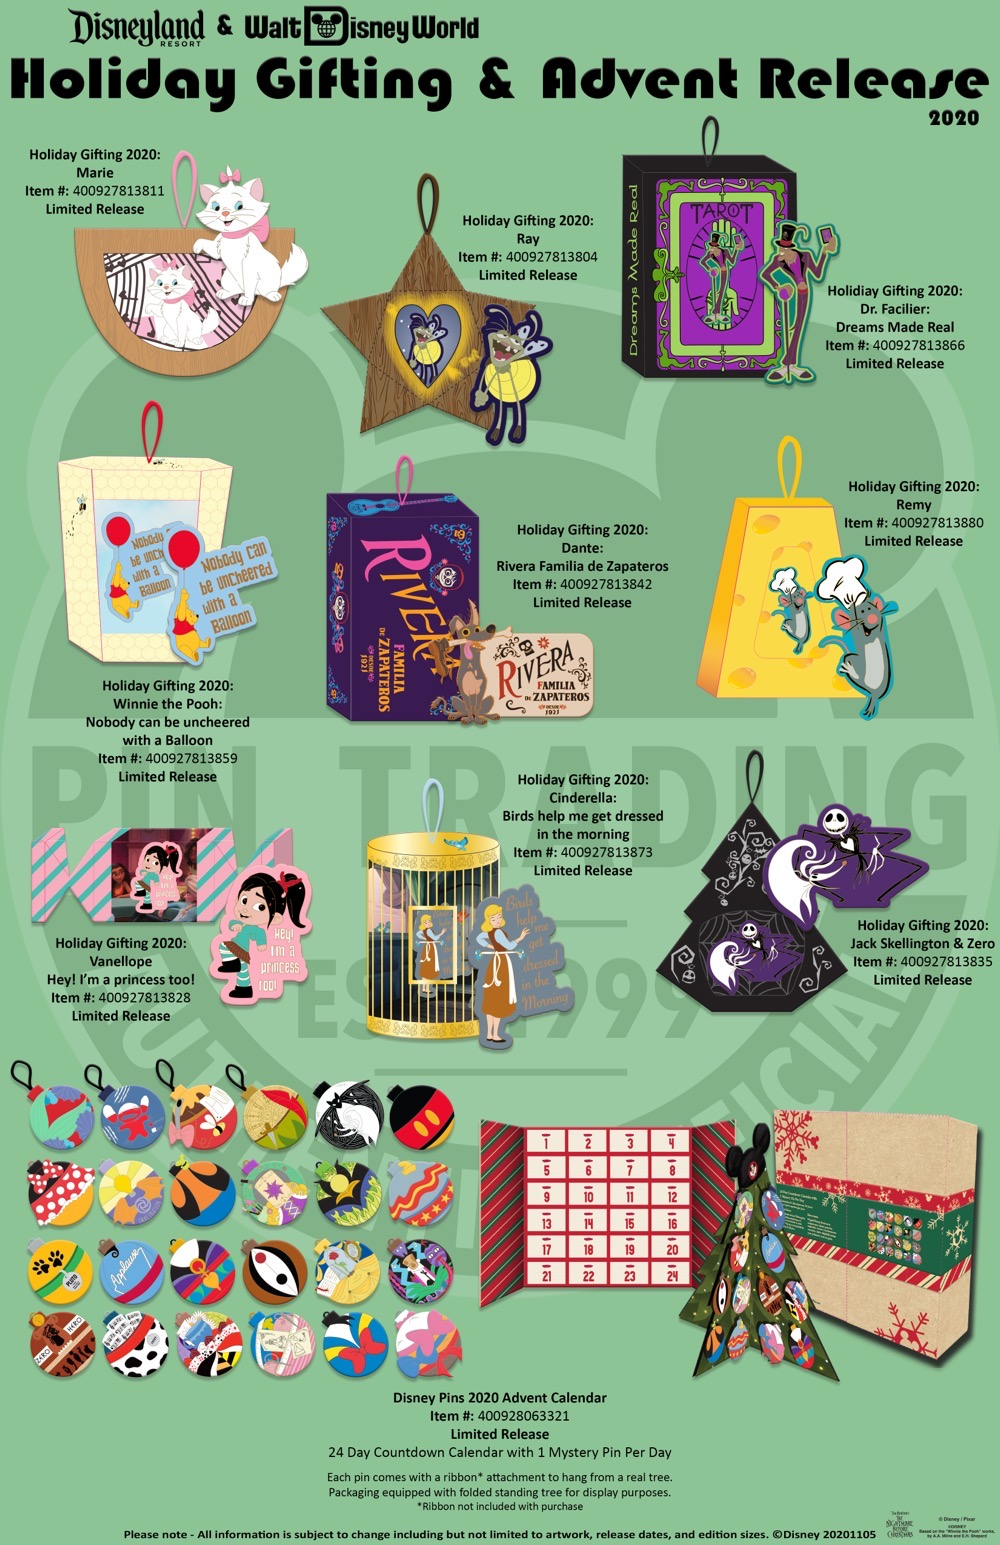 Holiday Gifting & Advent 2020 Disney Pins